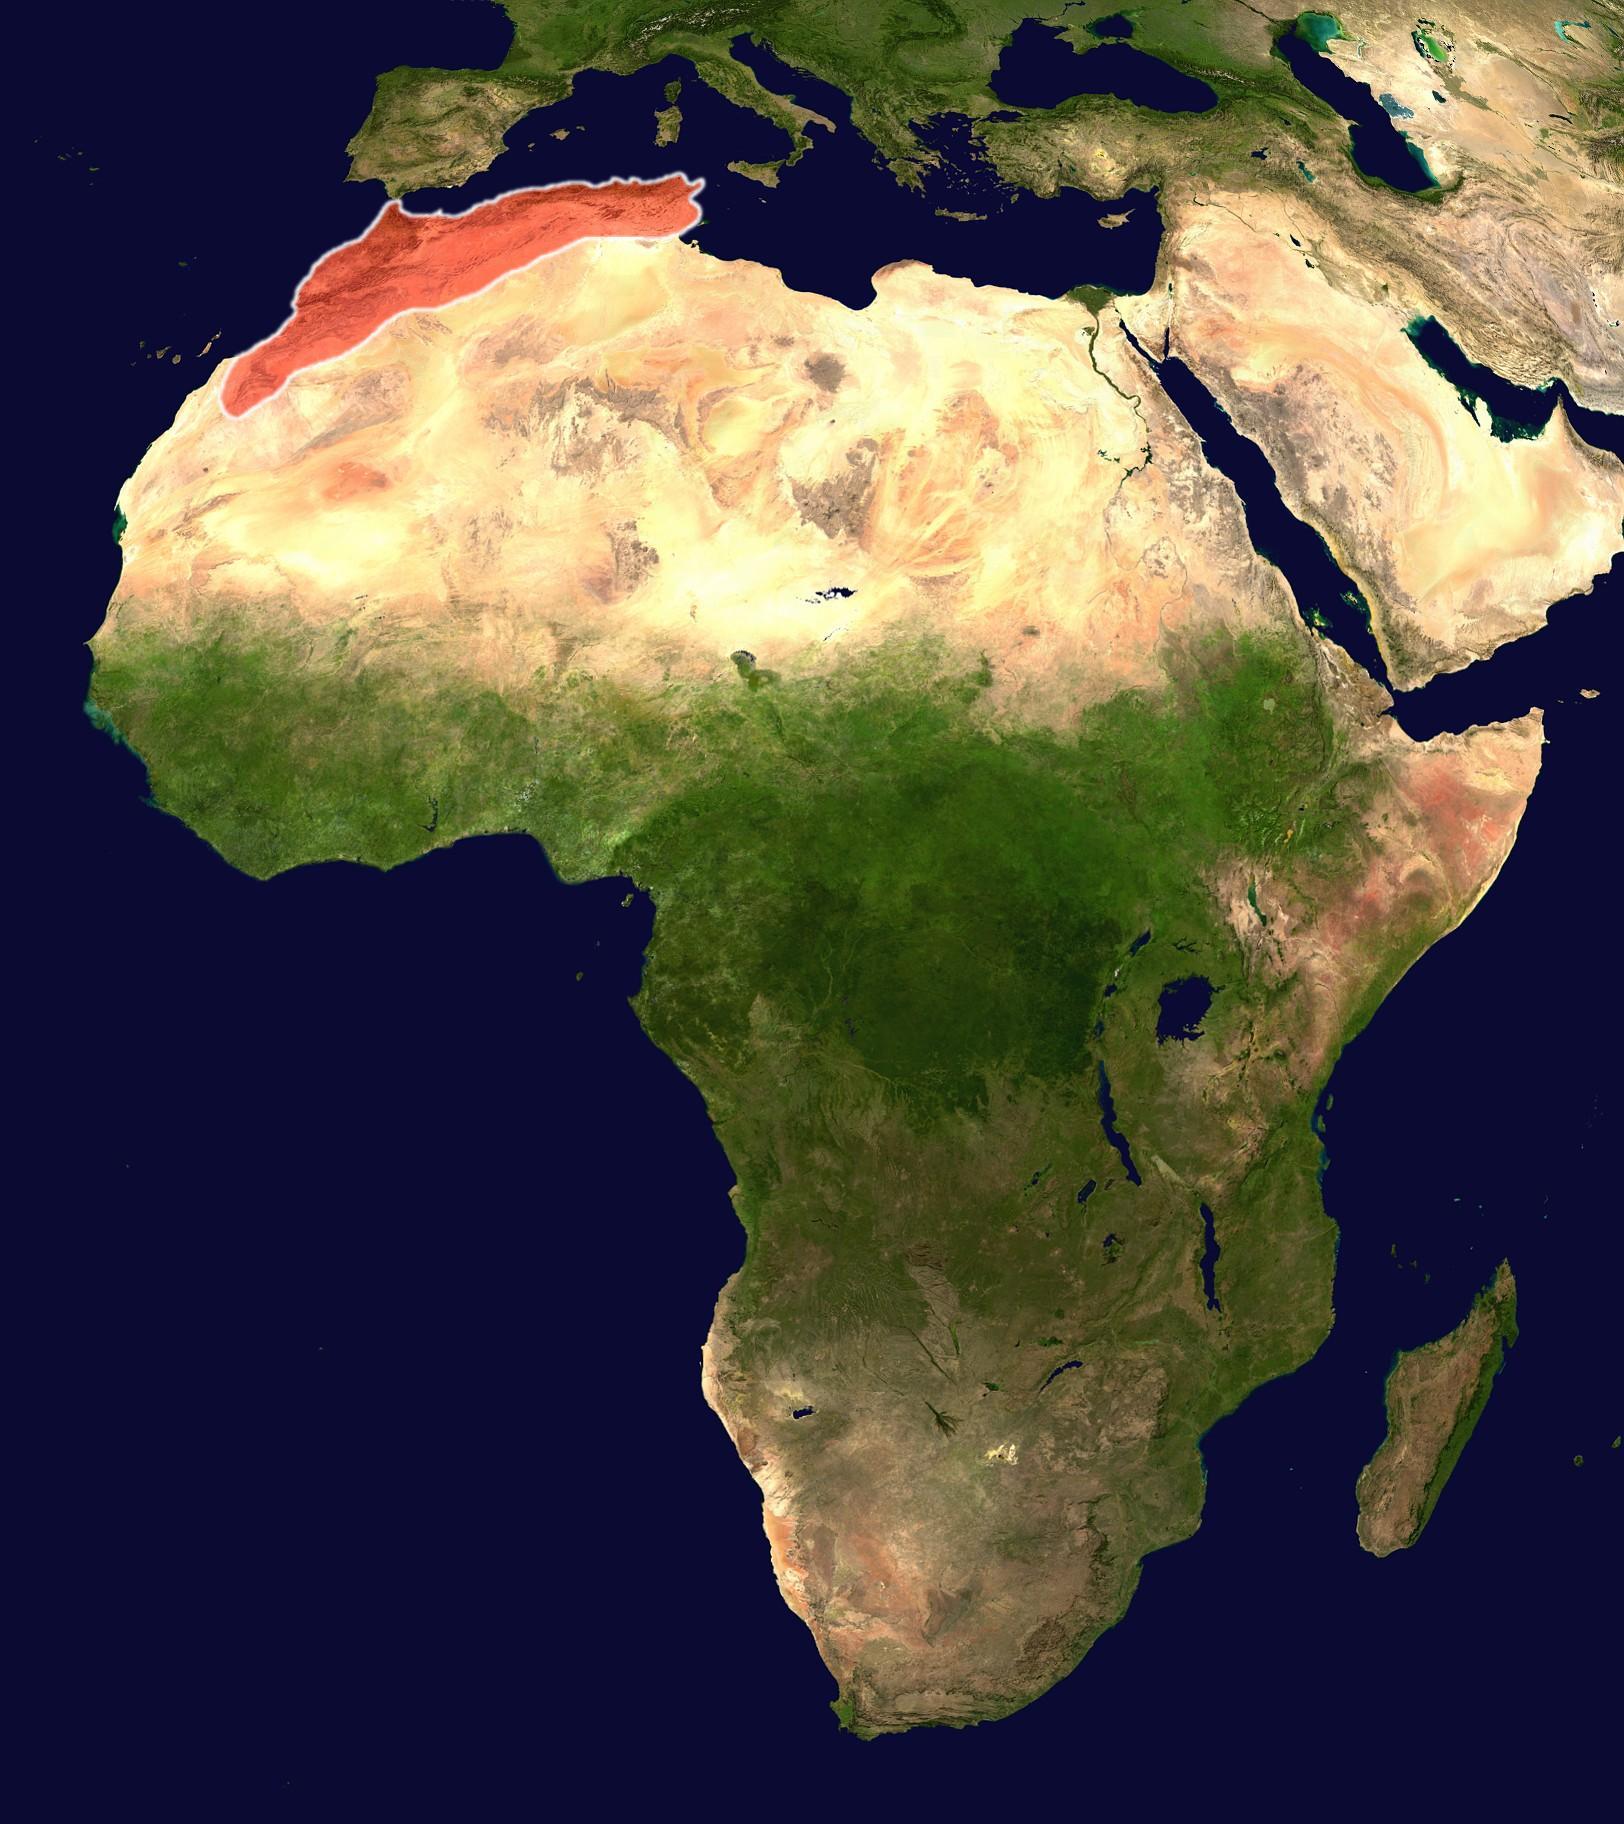 fileafrica atlas mountainsjpg wikimedia commons